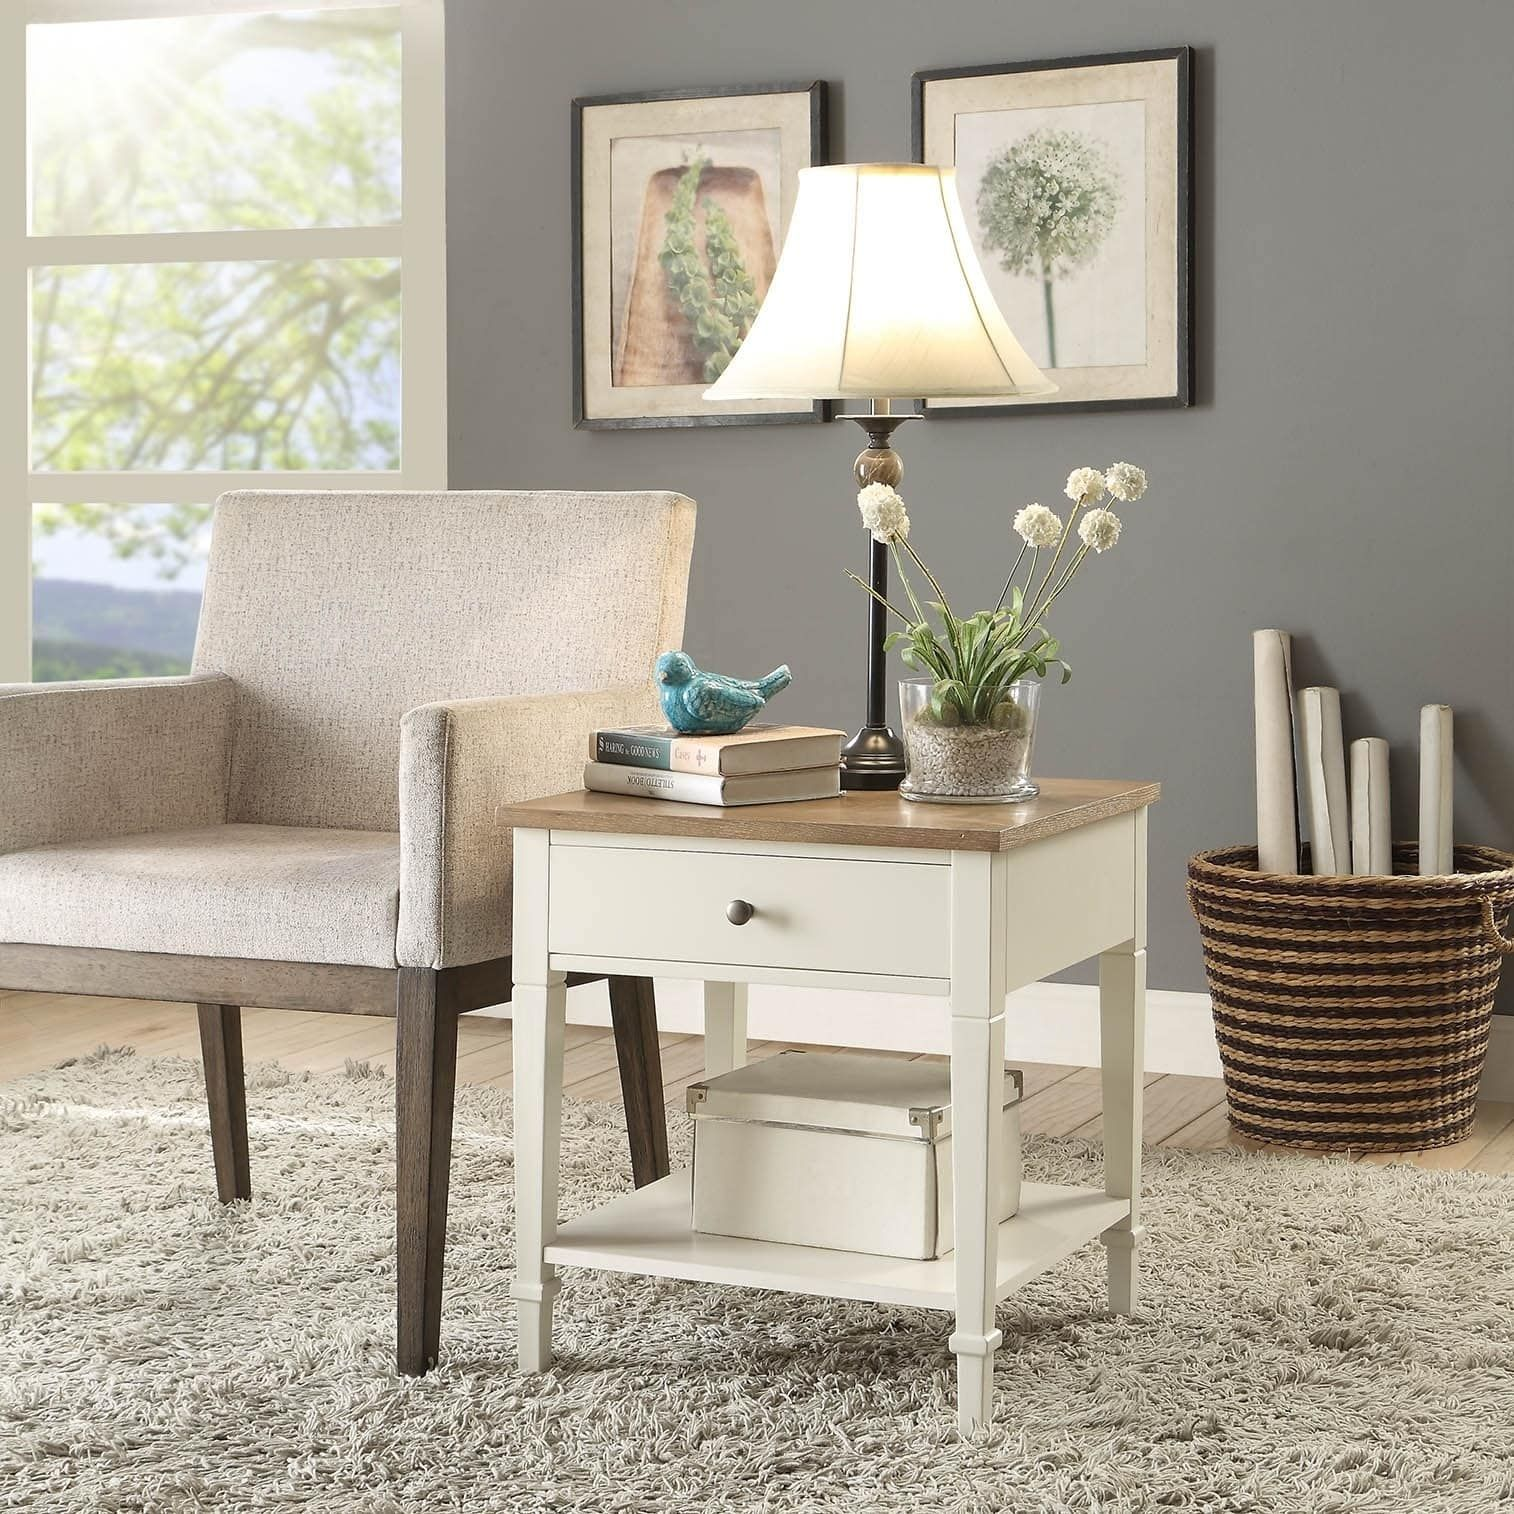 Fantastic Legacy Tevoli White Wood Side Table Products Sofa End Camellatalisay Diy Chair Ideas Camellatalisaycom